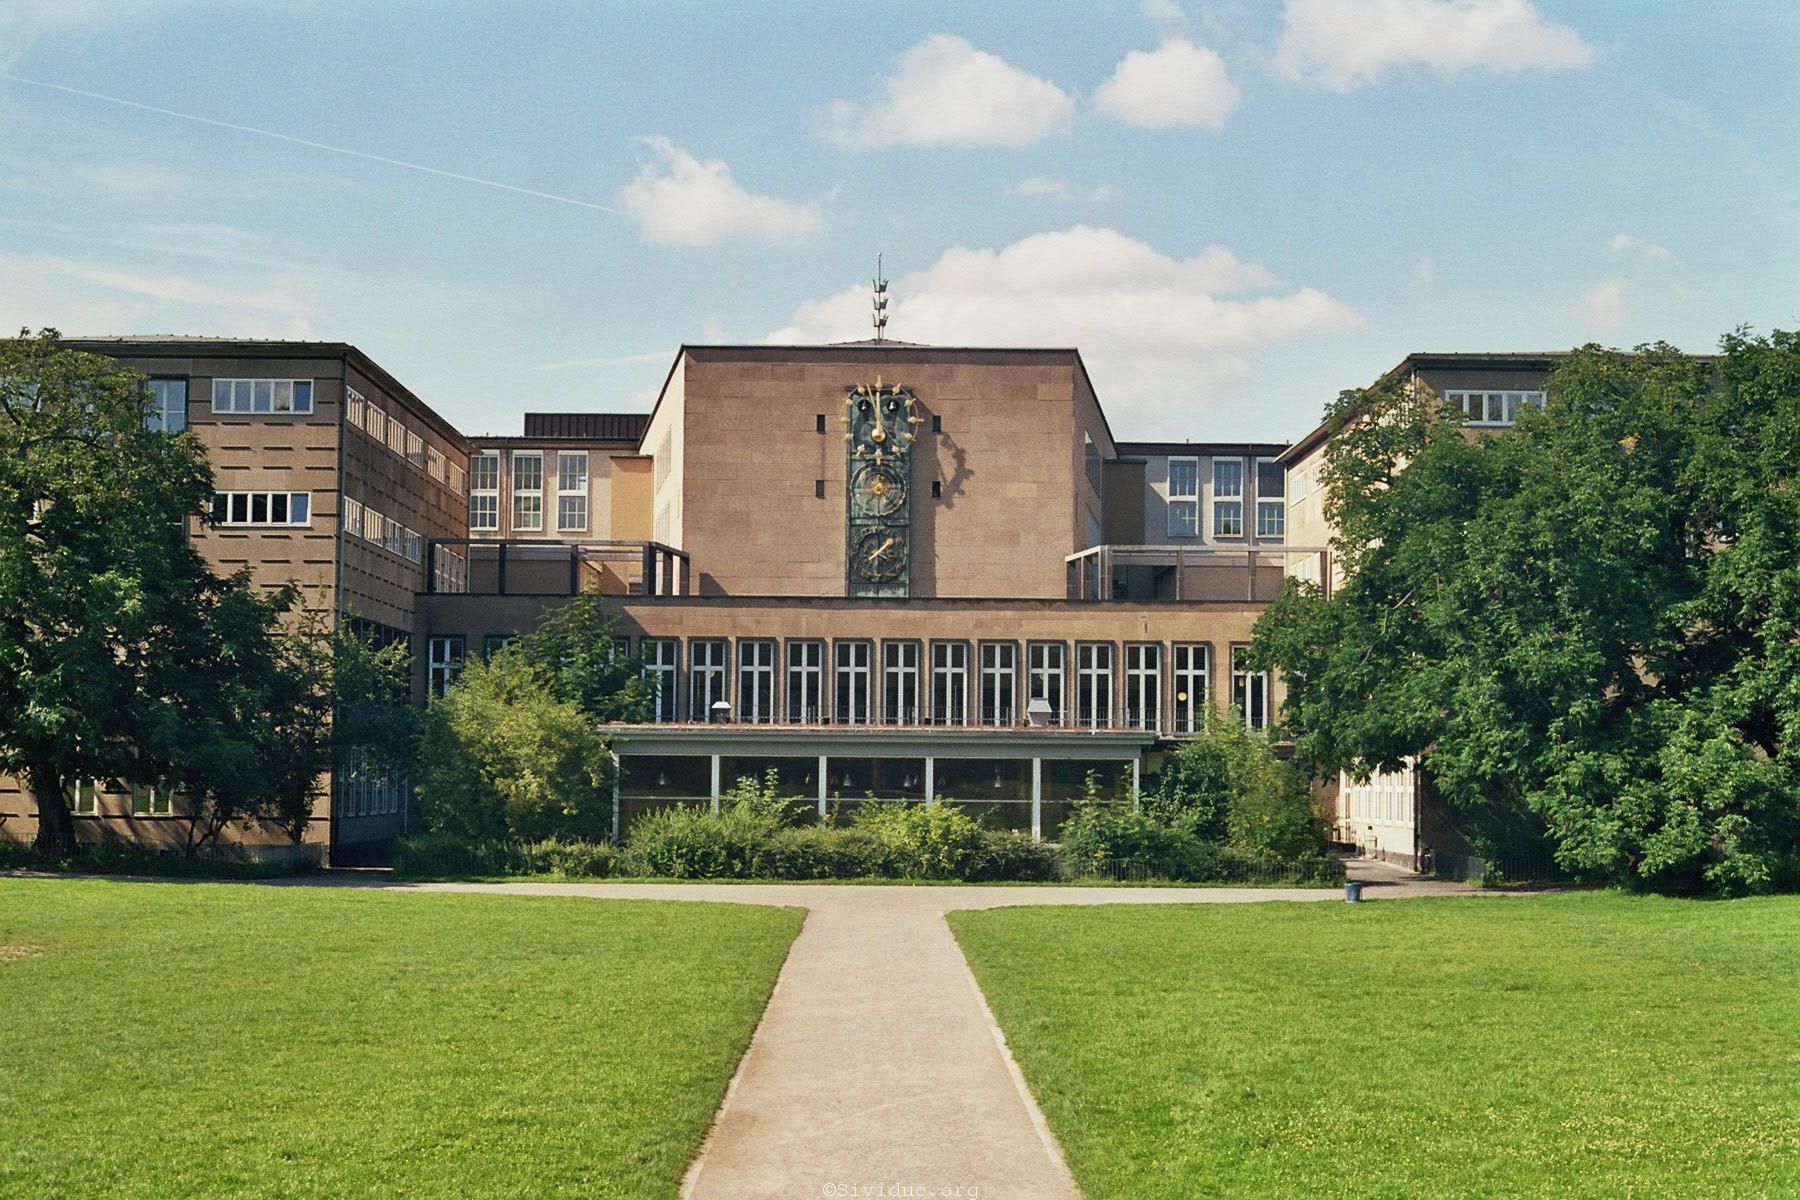 Universitat_zu_Koln